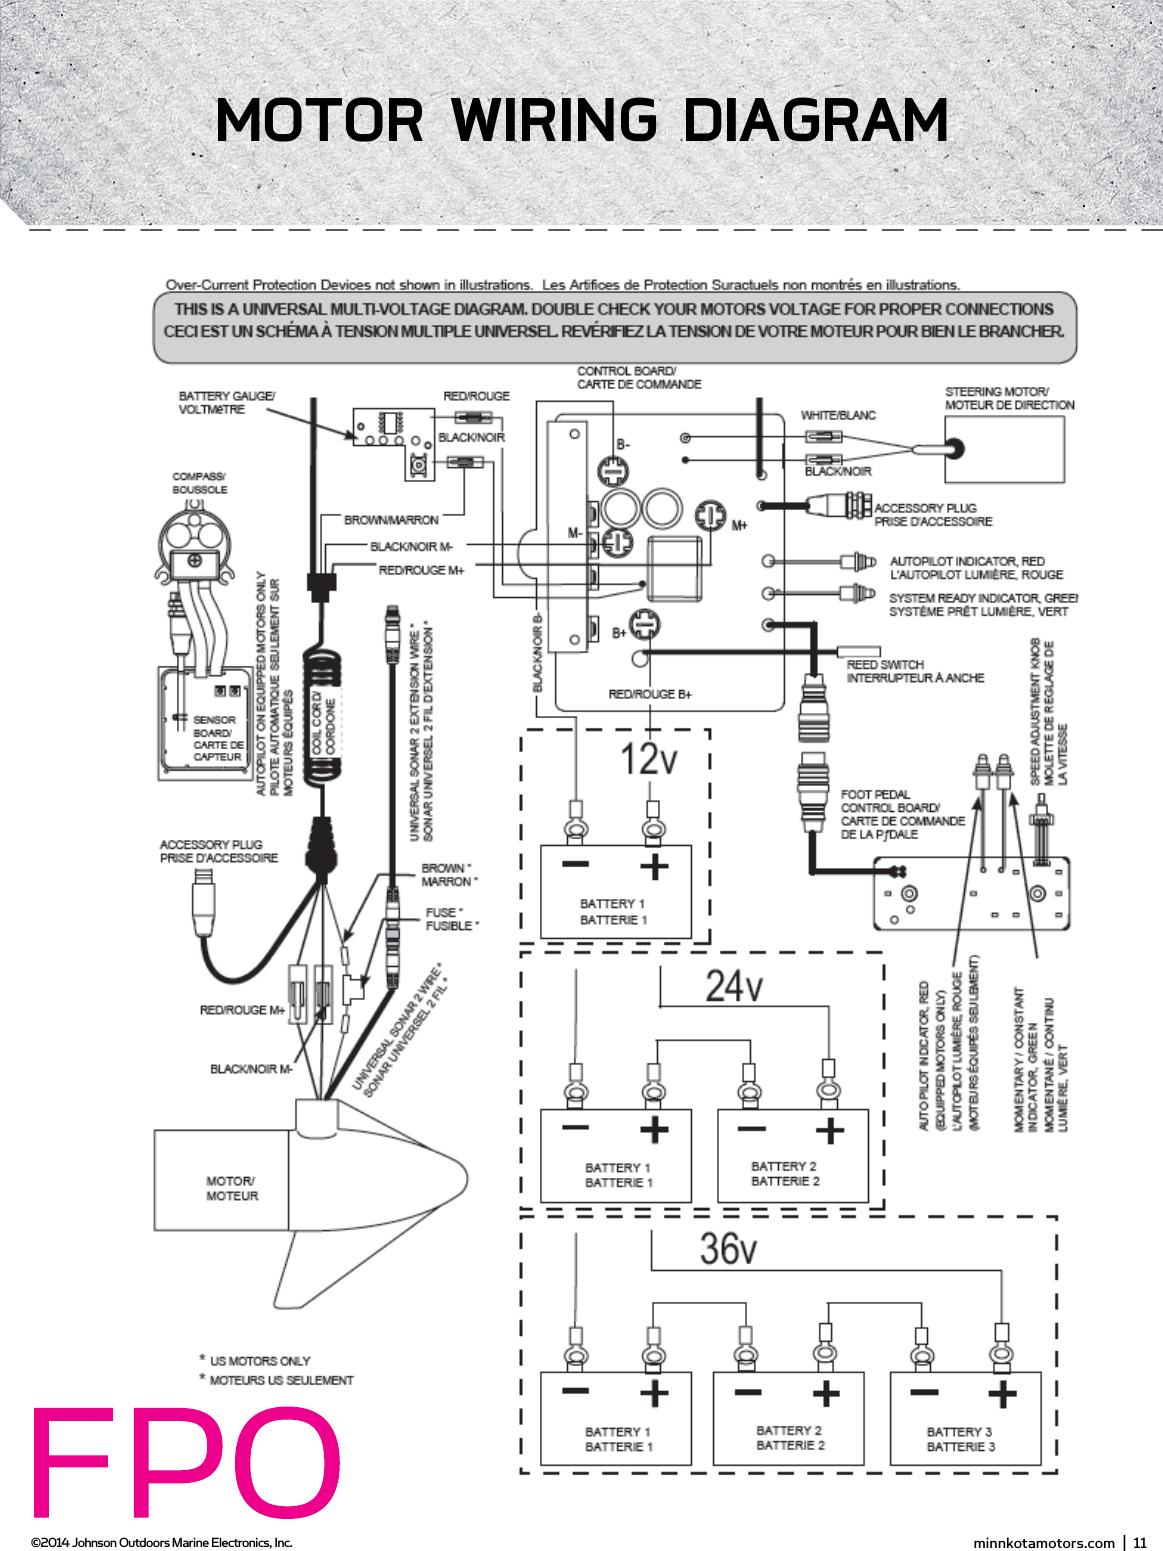 Minn Kota Wiring Schematic -Advantages Of Block Diagram | Begeboy Wiring  Diagram SourceBegeboy Wiring Diagram Source